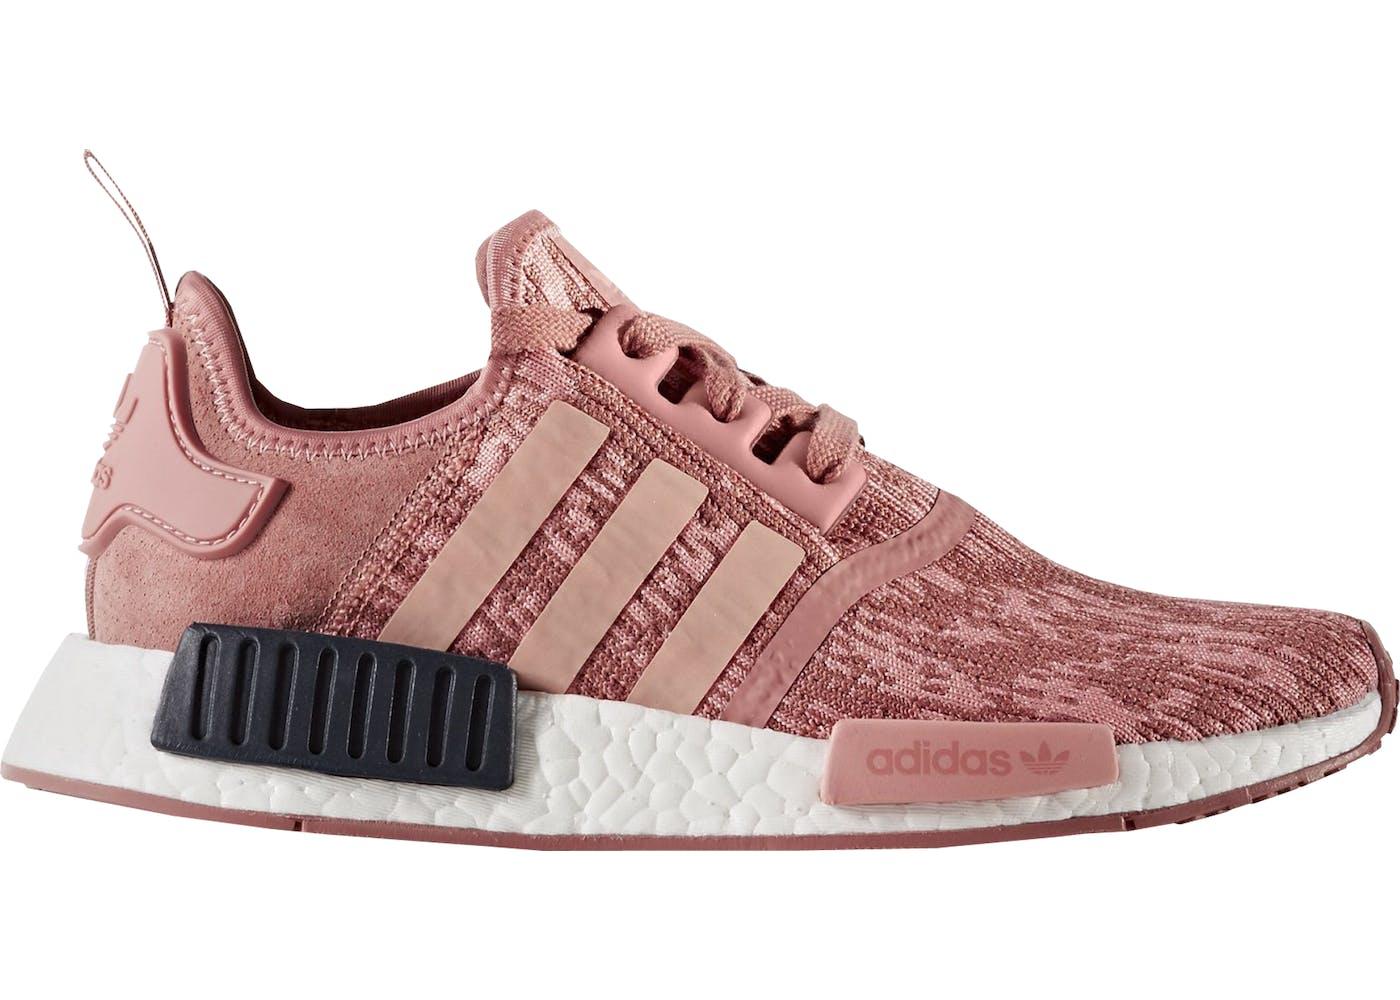 adidas nmd r1 raw pink glitch w. Black Bedroom Furniture Sets. Home Design Ideas